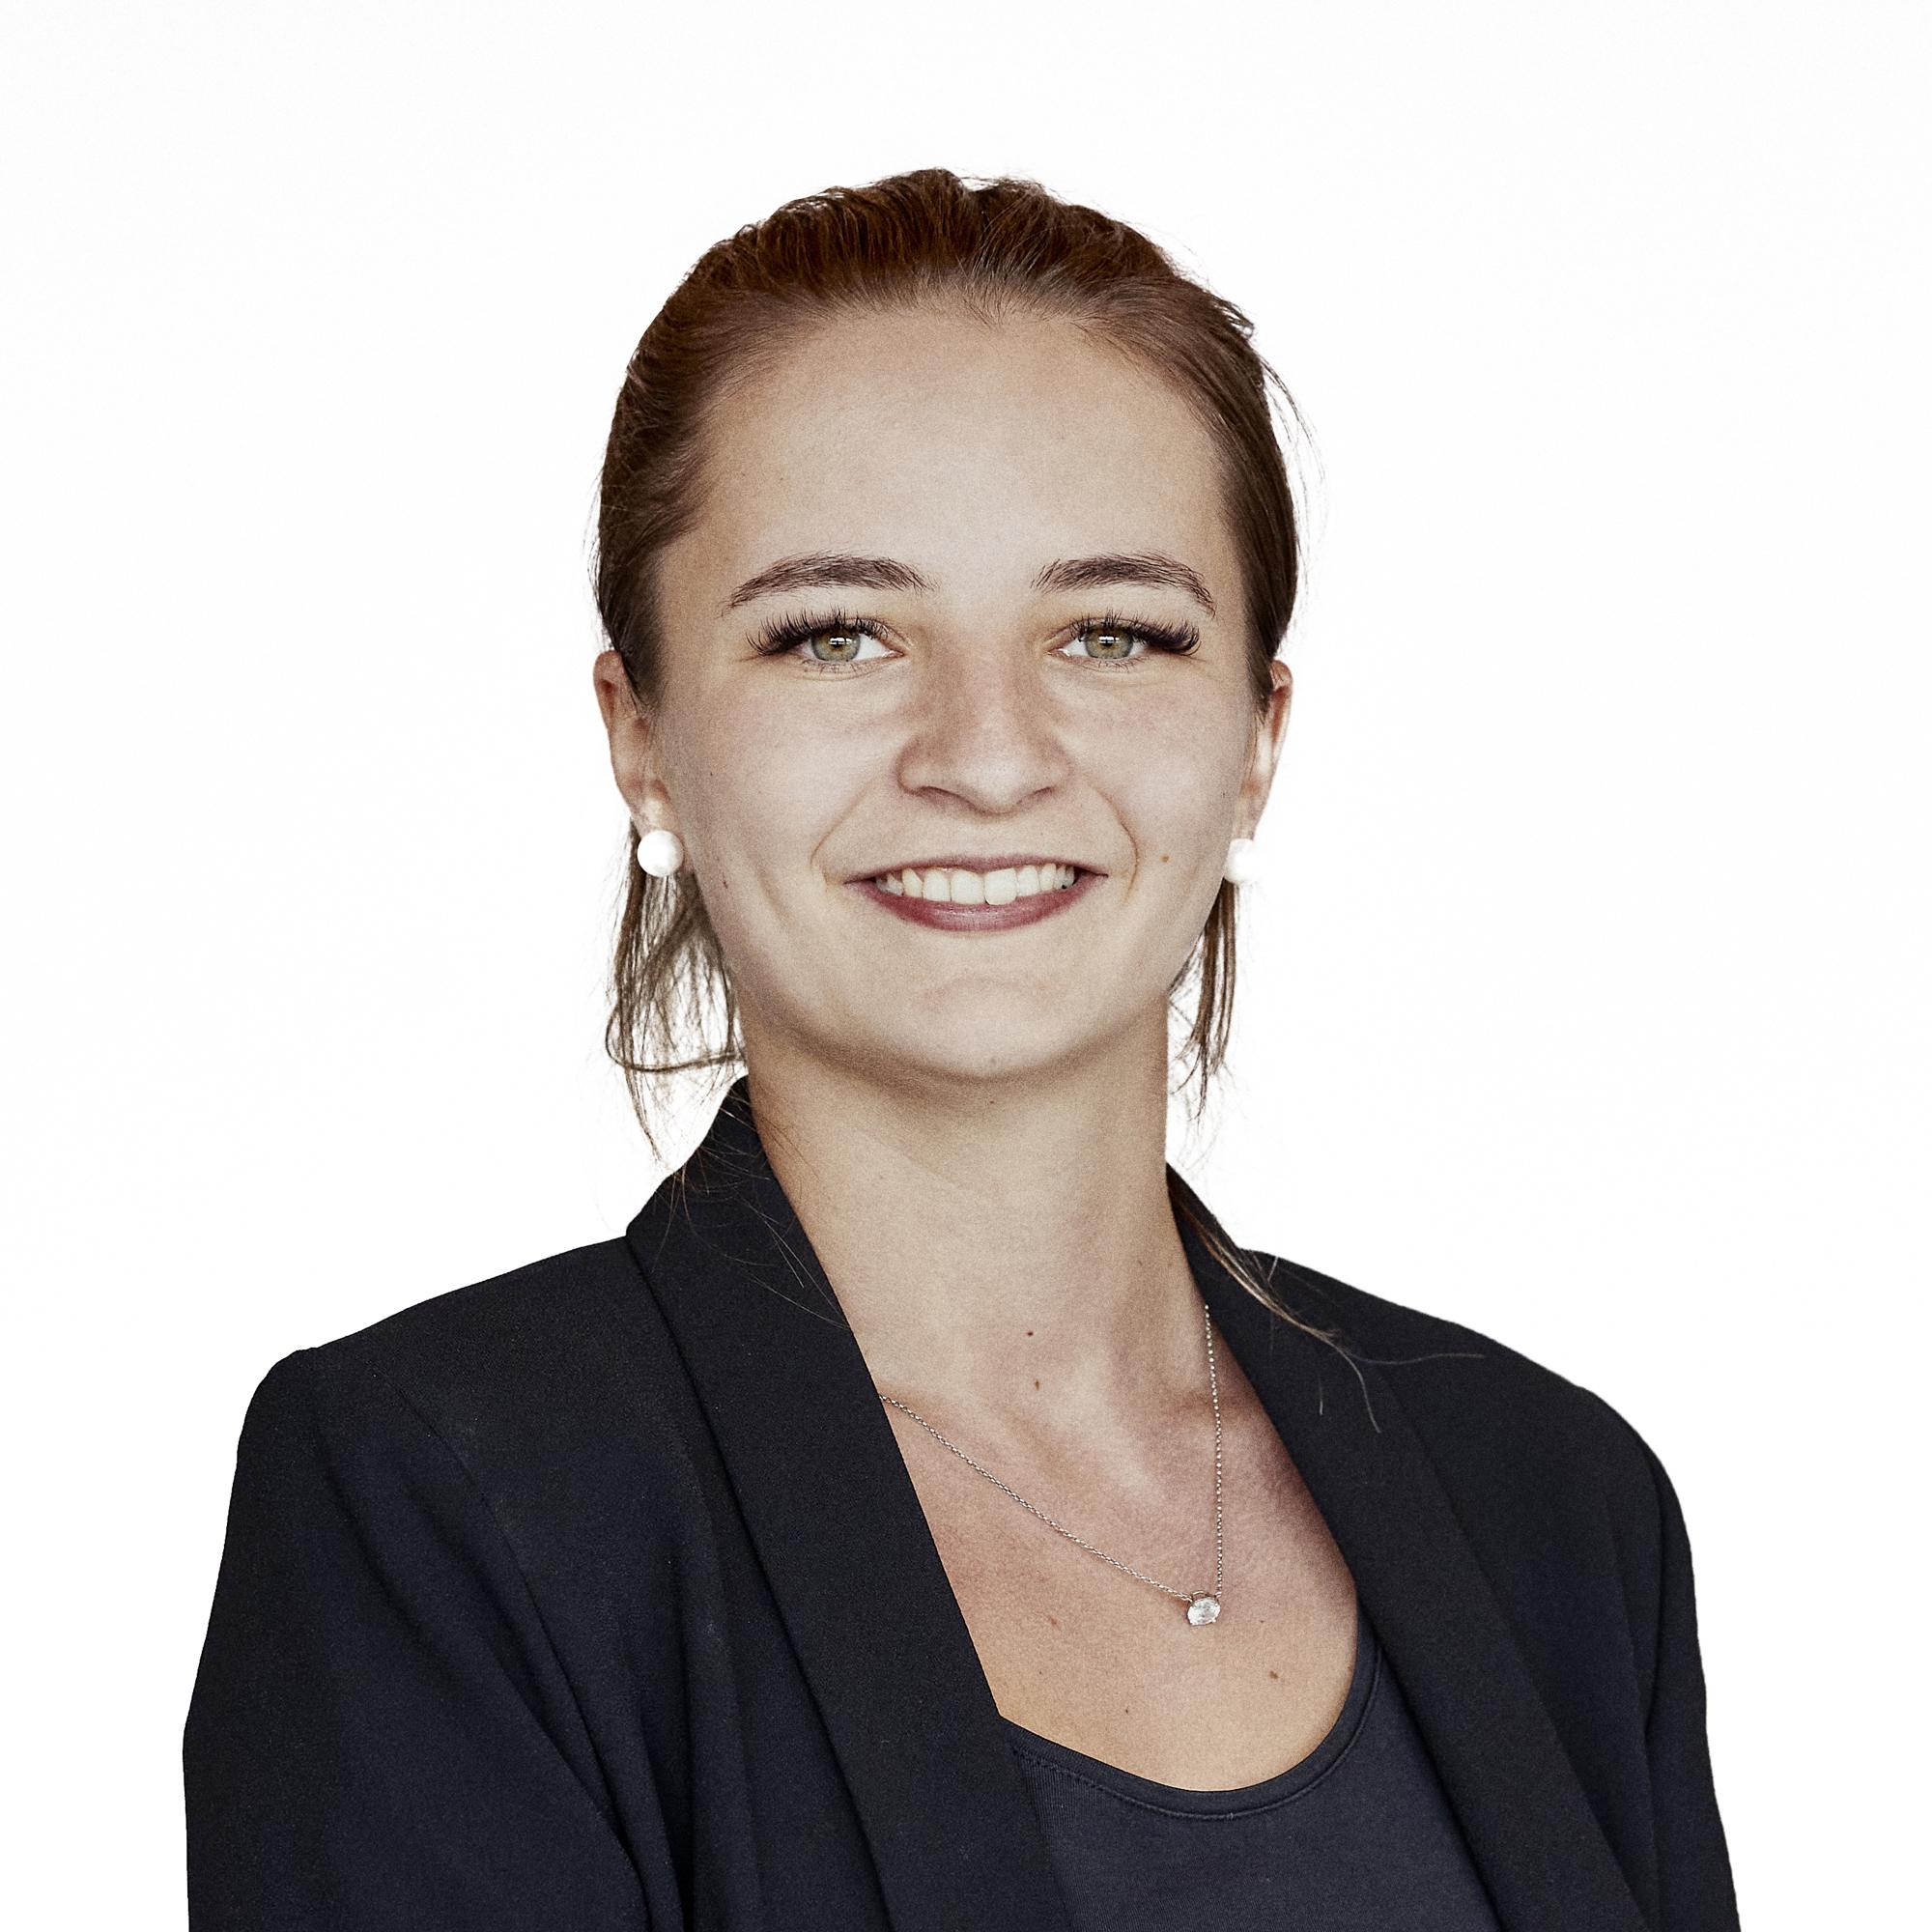 Morgane Van Campenhout